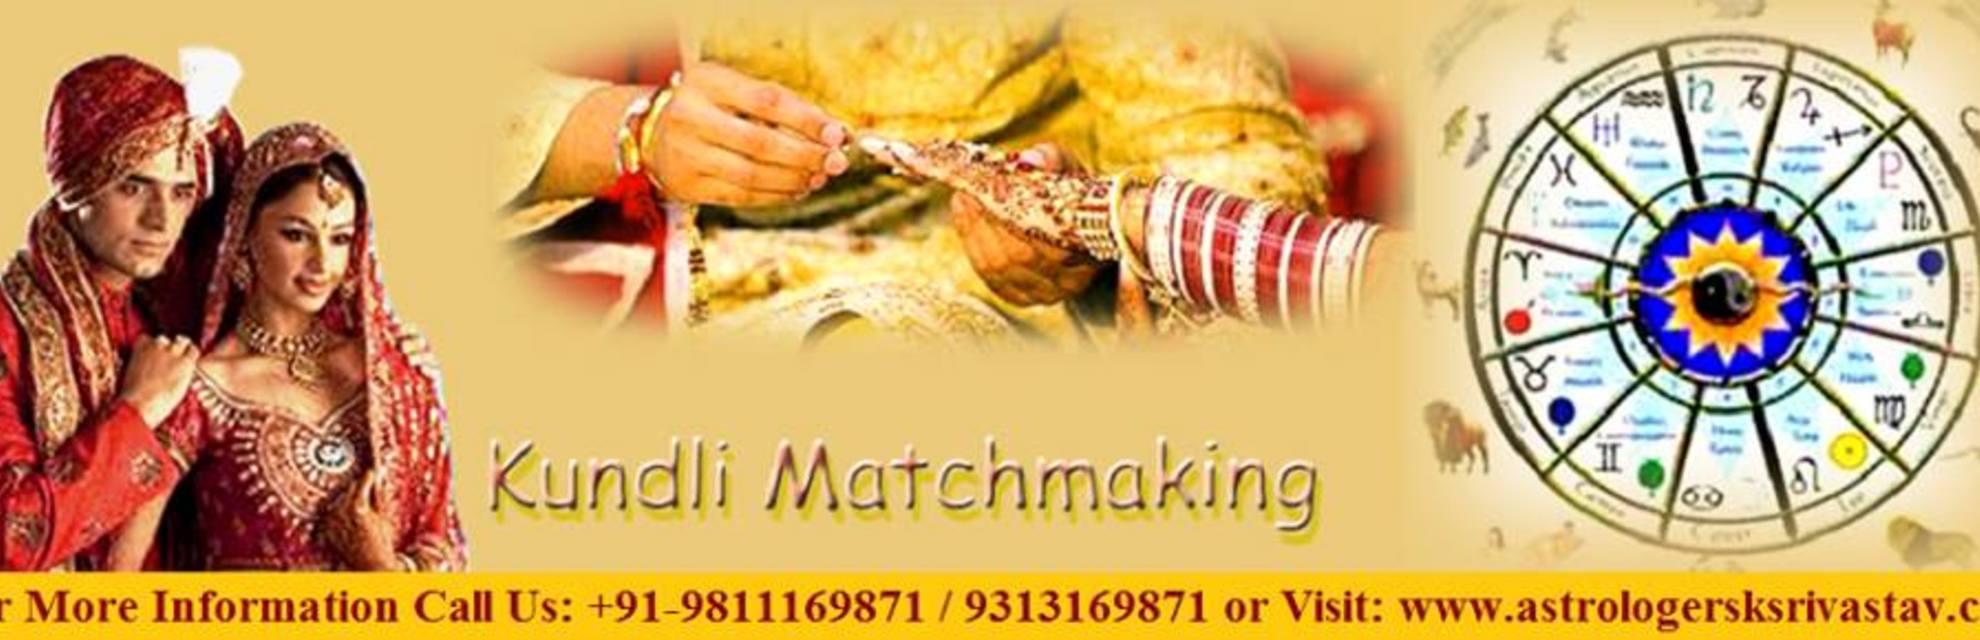 Kundali match making in gujarati